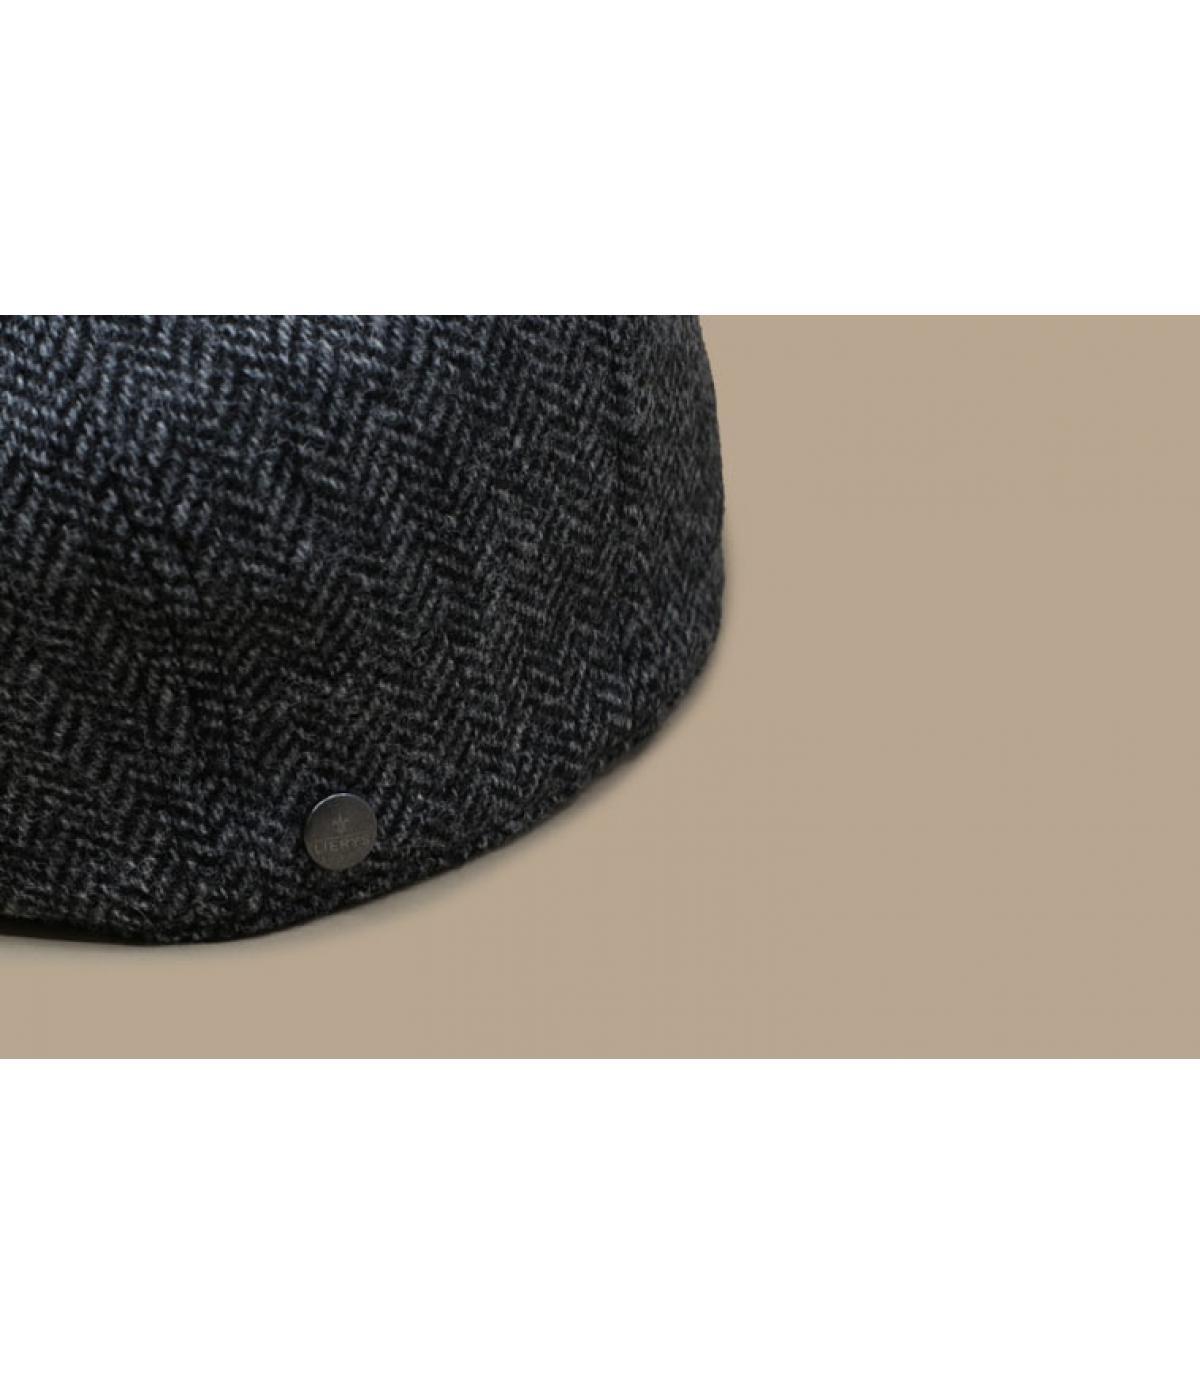 Details Britton Wool Herringbone grey - Abbildung 3